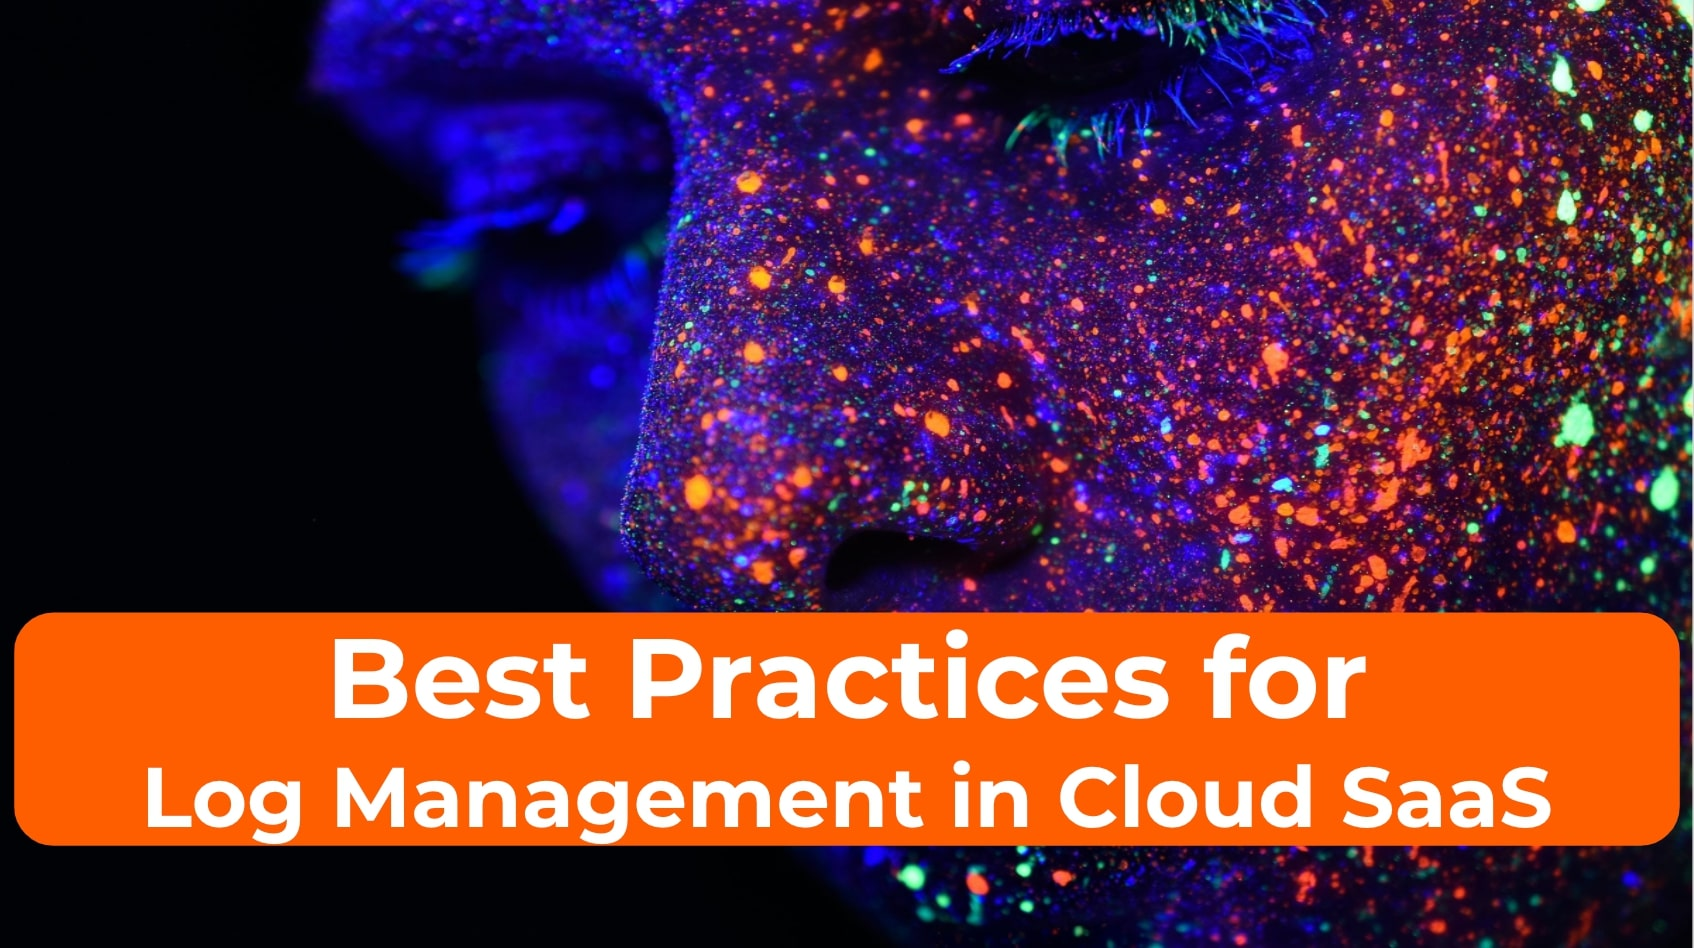 Log Management in Cloud SaaS: Best Practices